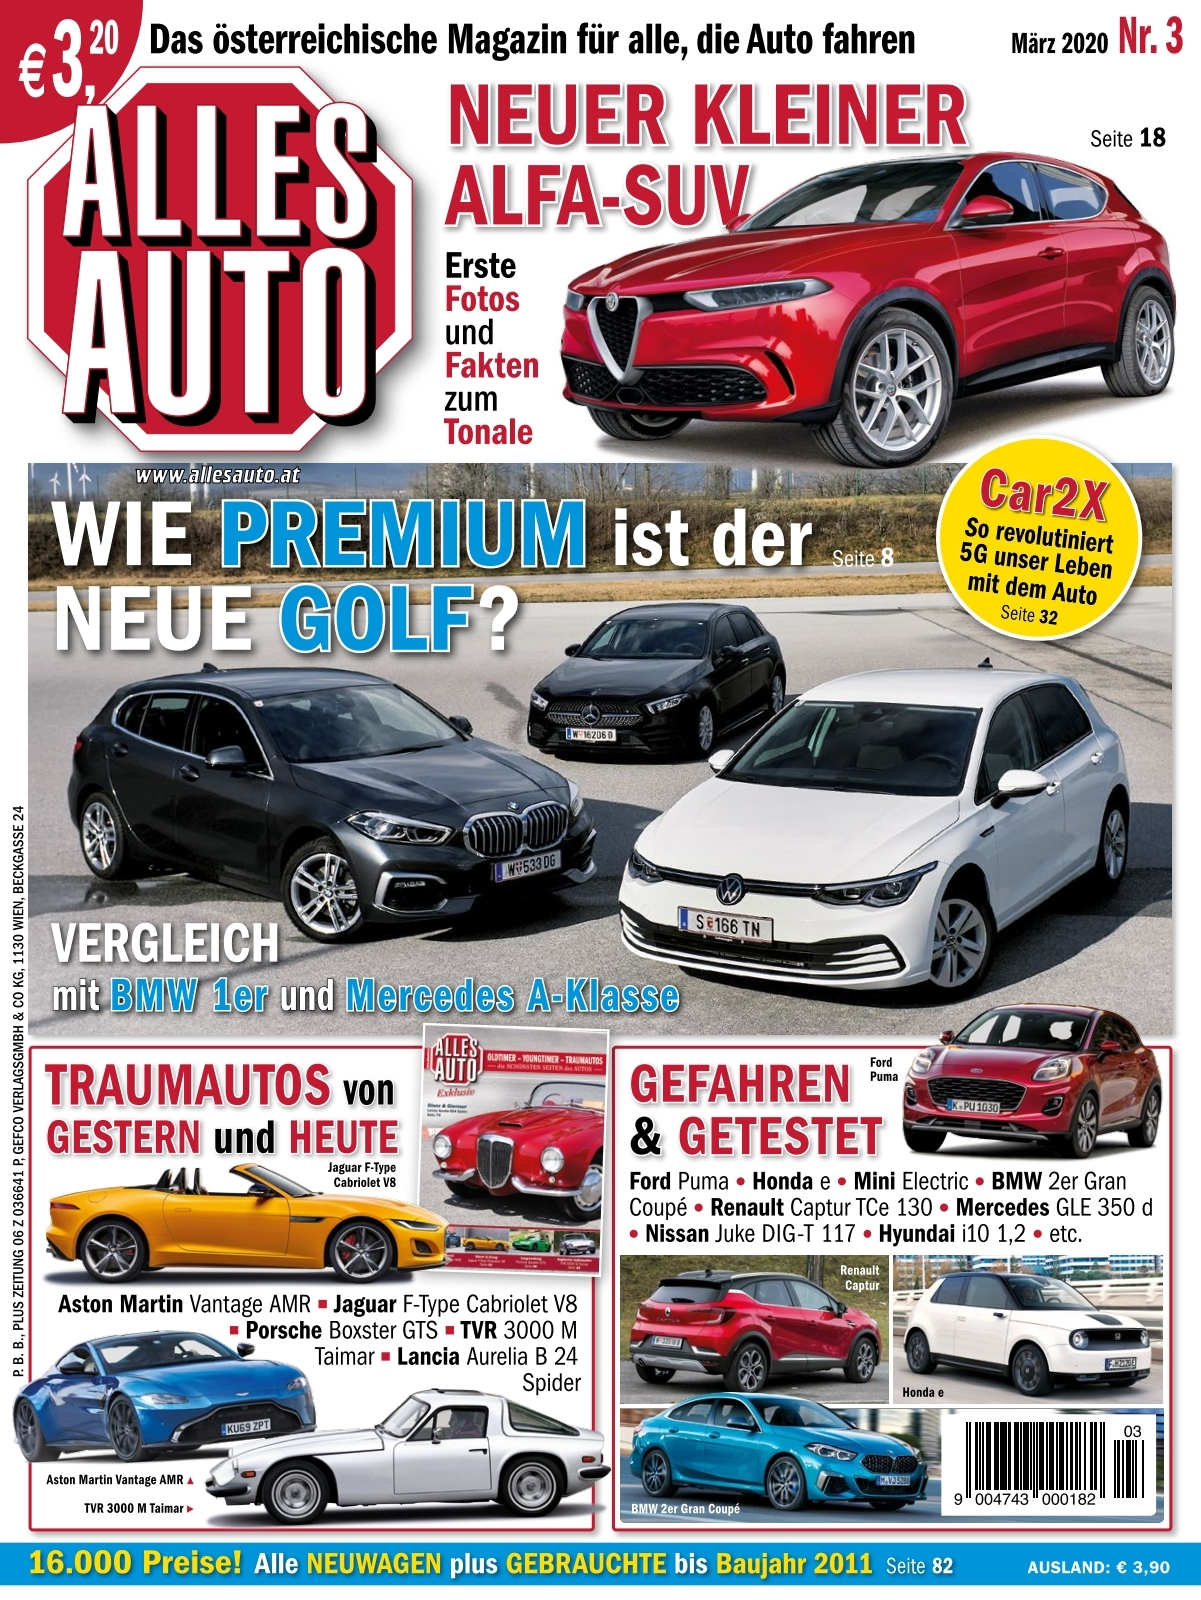 1//18 1//12 Mercedes Benz Kofferraum Stern Star modell MB Emblem 1//20 1//24 1//32